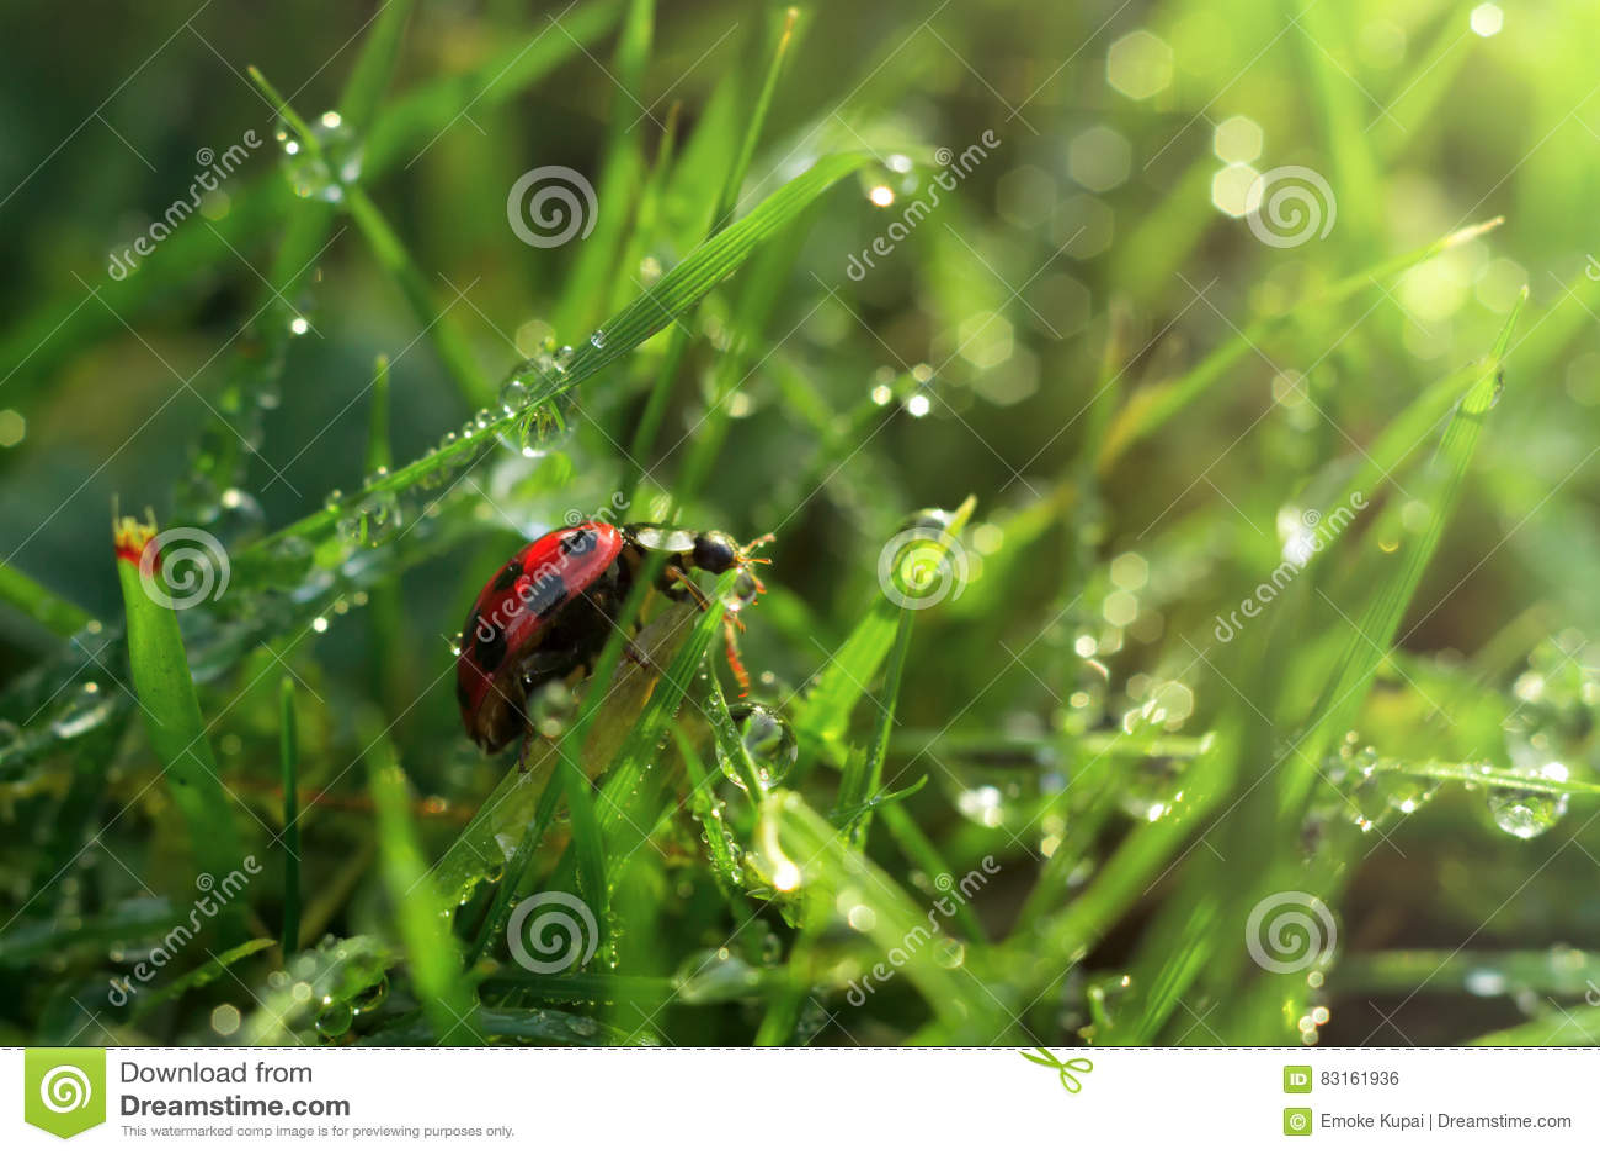 The Ladybug on a dewy grass